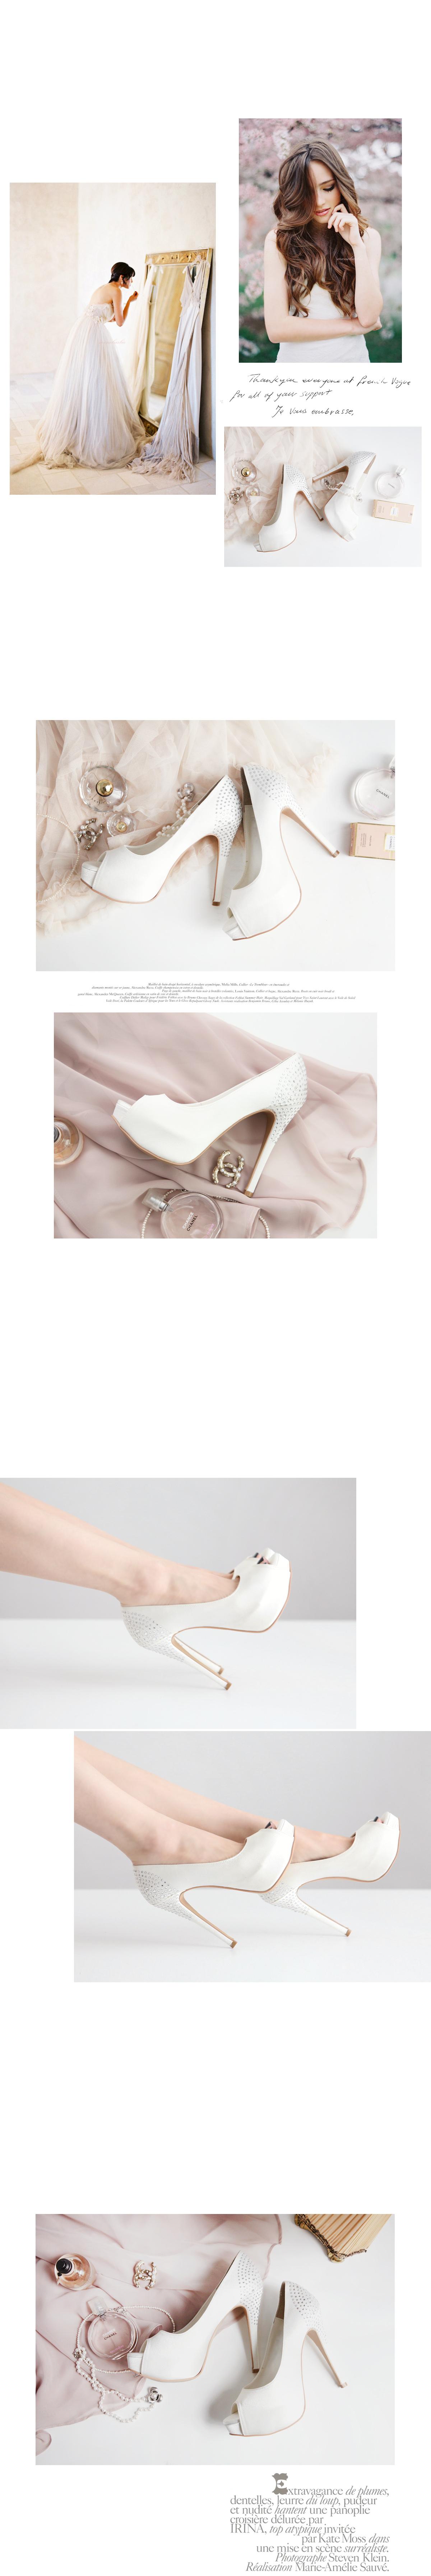 Shurin 12.5cm Mono Barbie Free Shipping